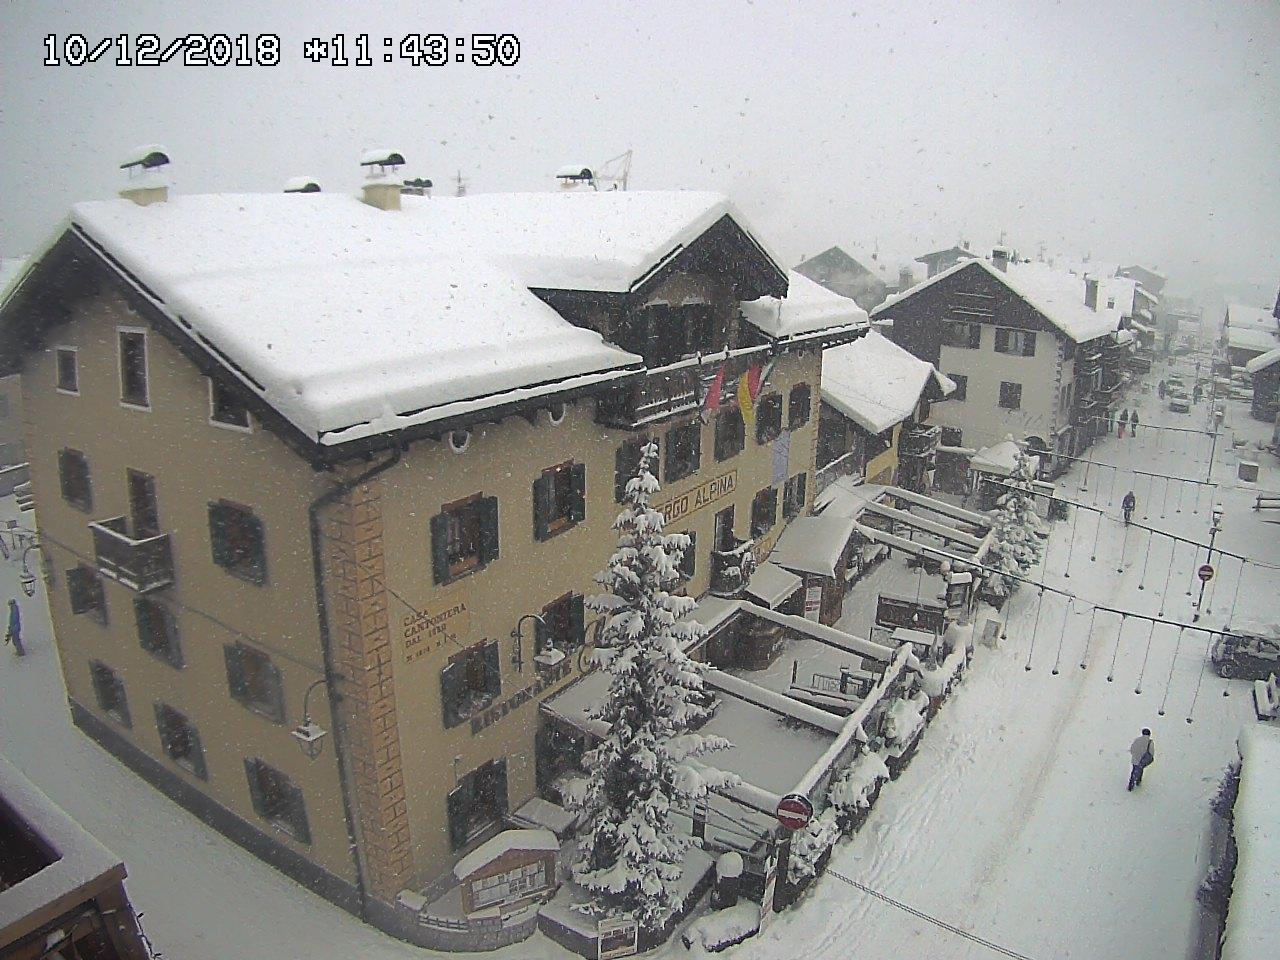 Nowcasting Valtellina, Valchiavenna, Orobie e Lario: INVERNO 2018-19-alpina.jpg